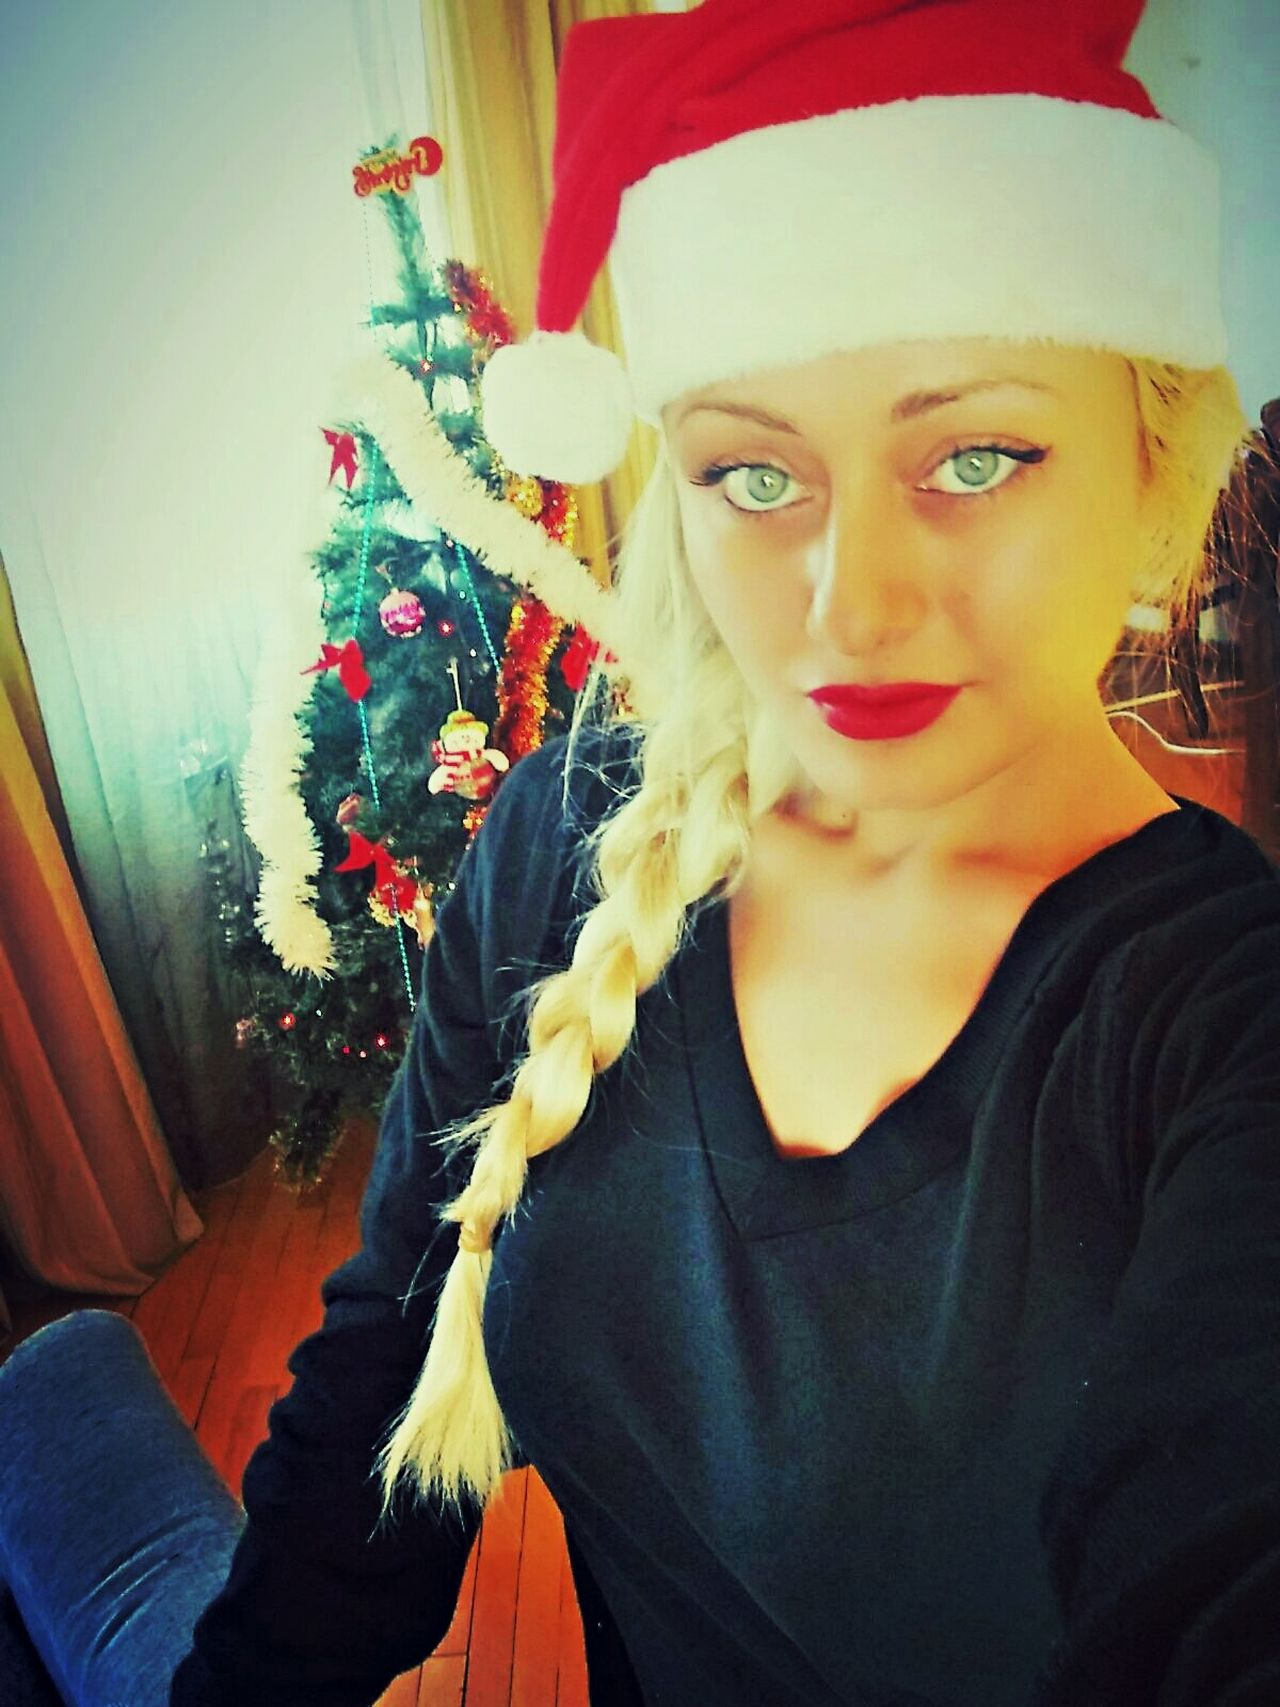 Merry Christmas ♡ Christmas Time Christmas Is Coming Beauty ThatsMe Woman Of EyeEm Christmas Decorations Christmas Tree Hello World People Beautiful Day Season  Christmas Around The World Jolly